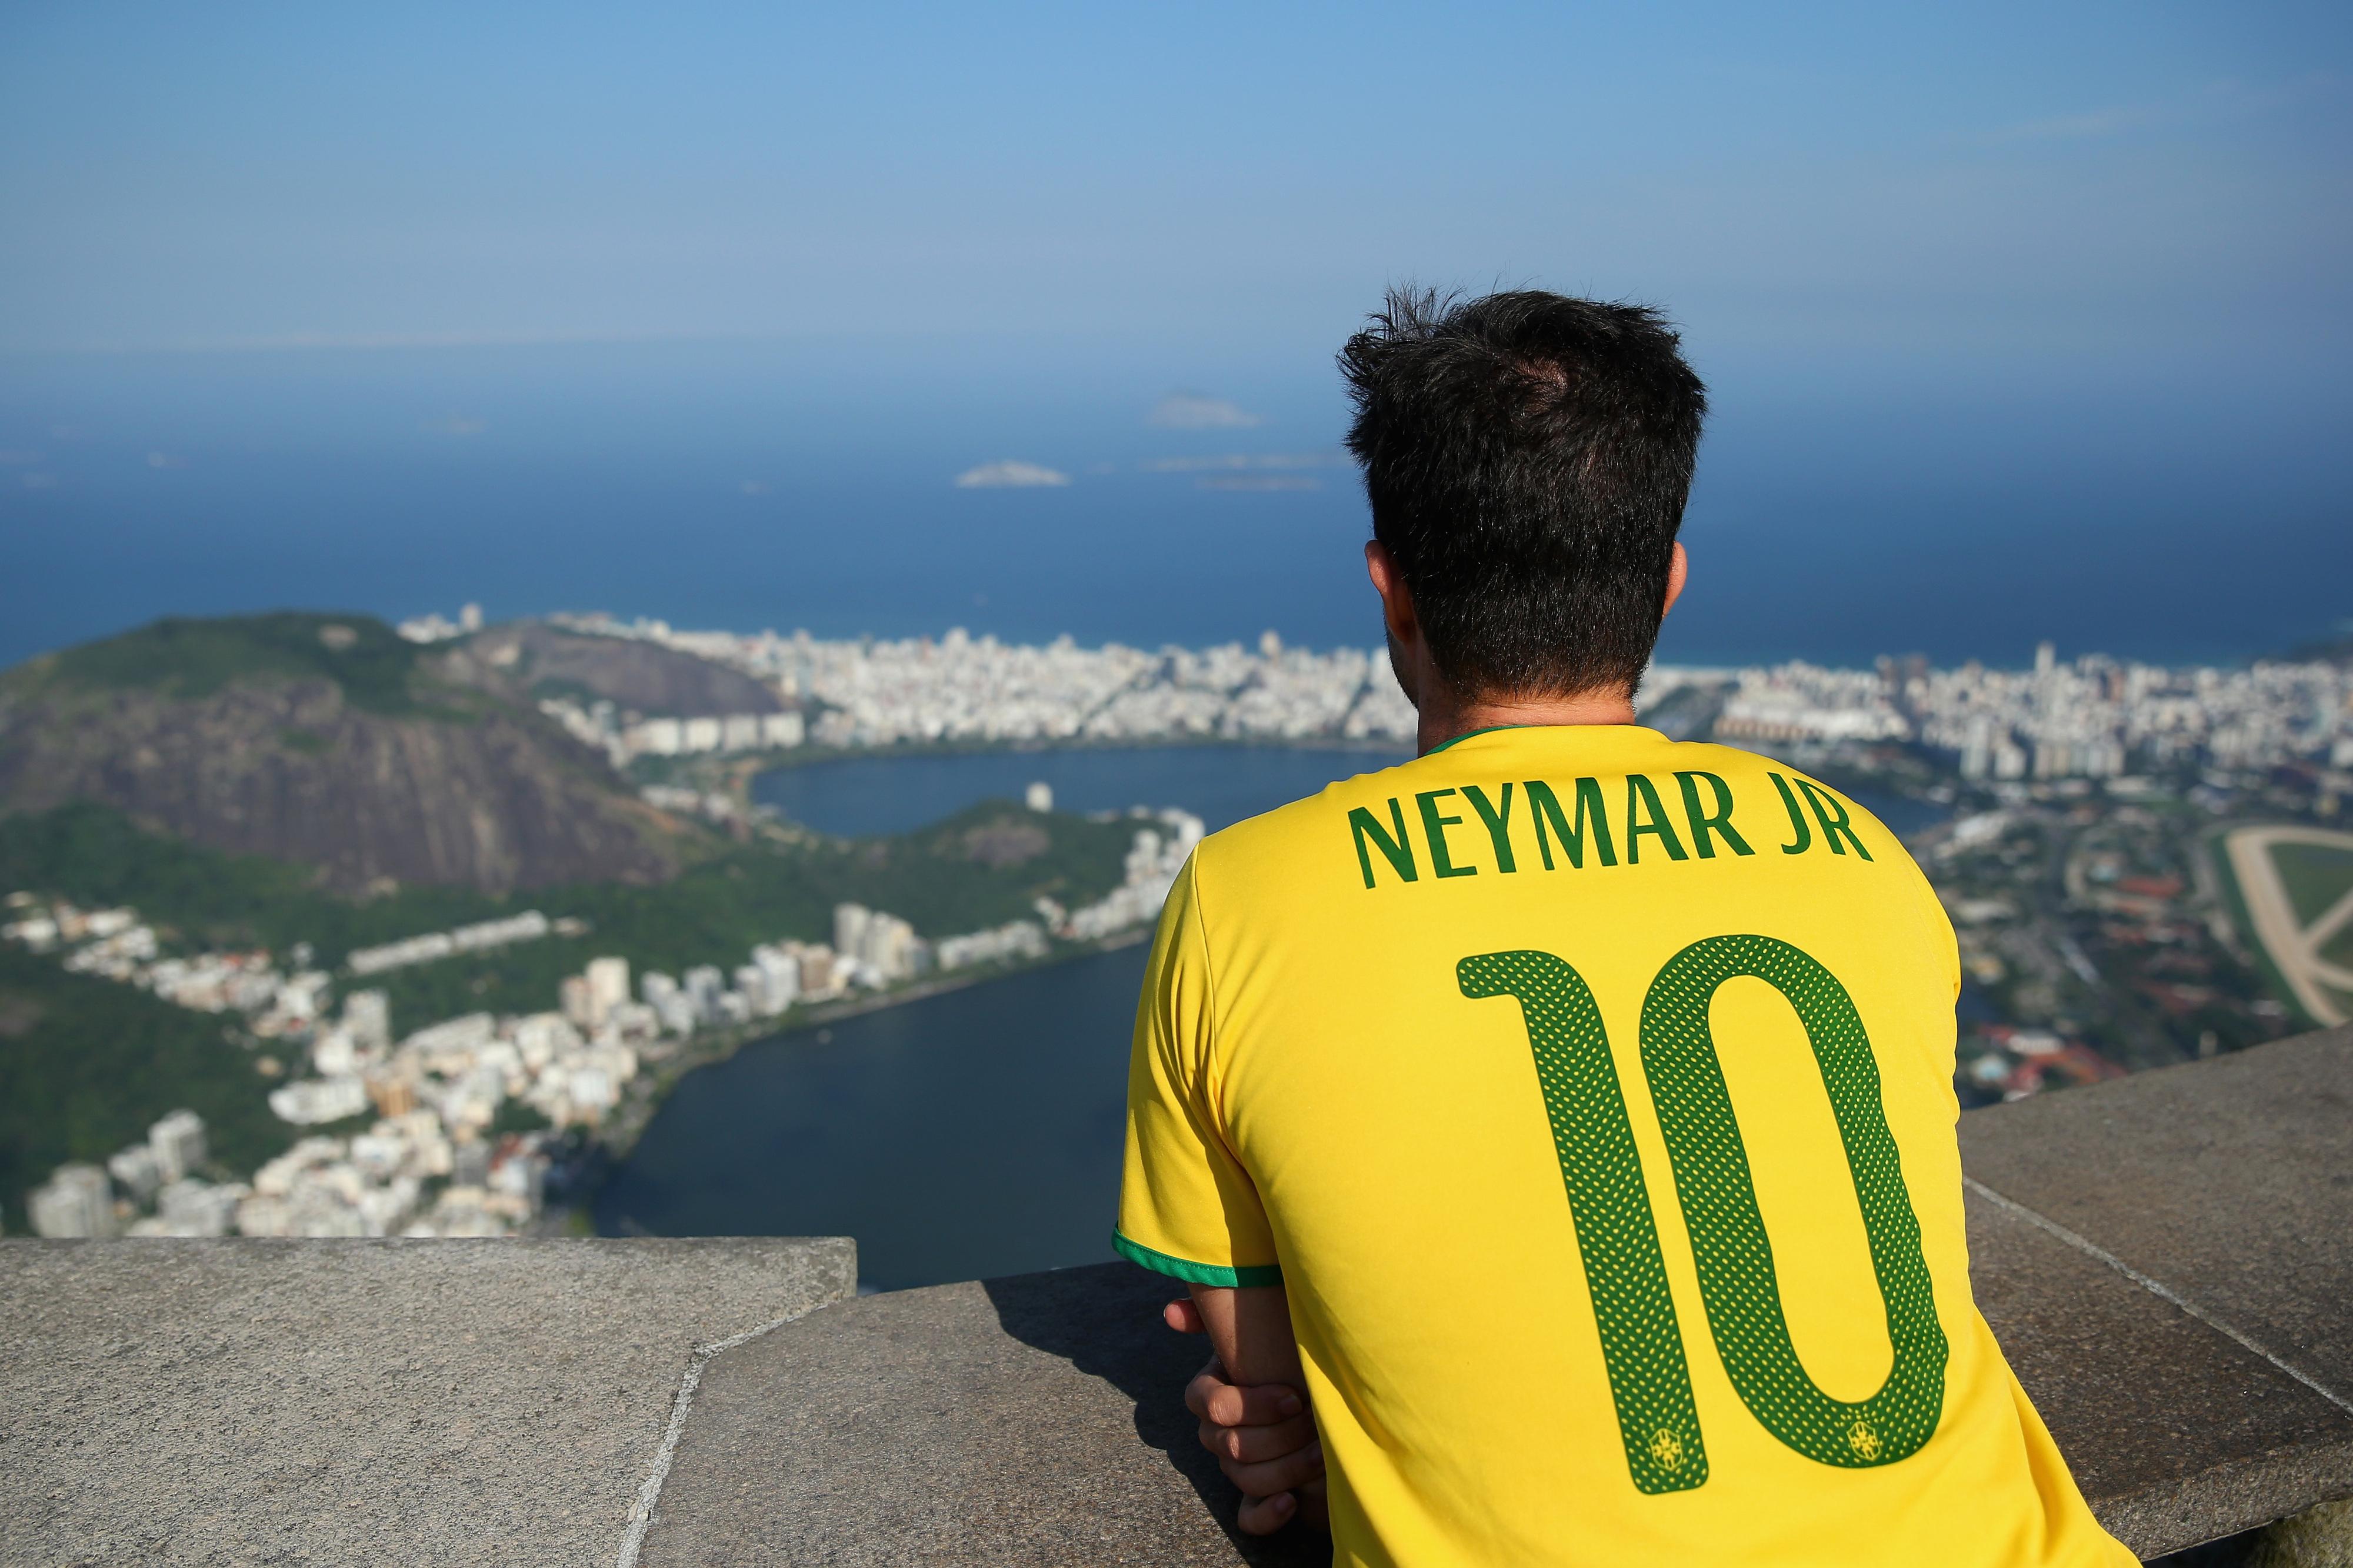 Neymar Jr: Destined for immortalisation